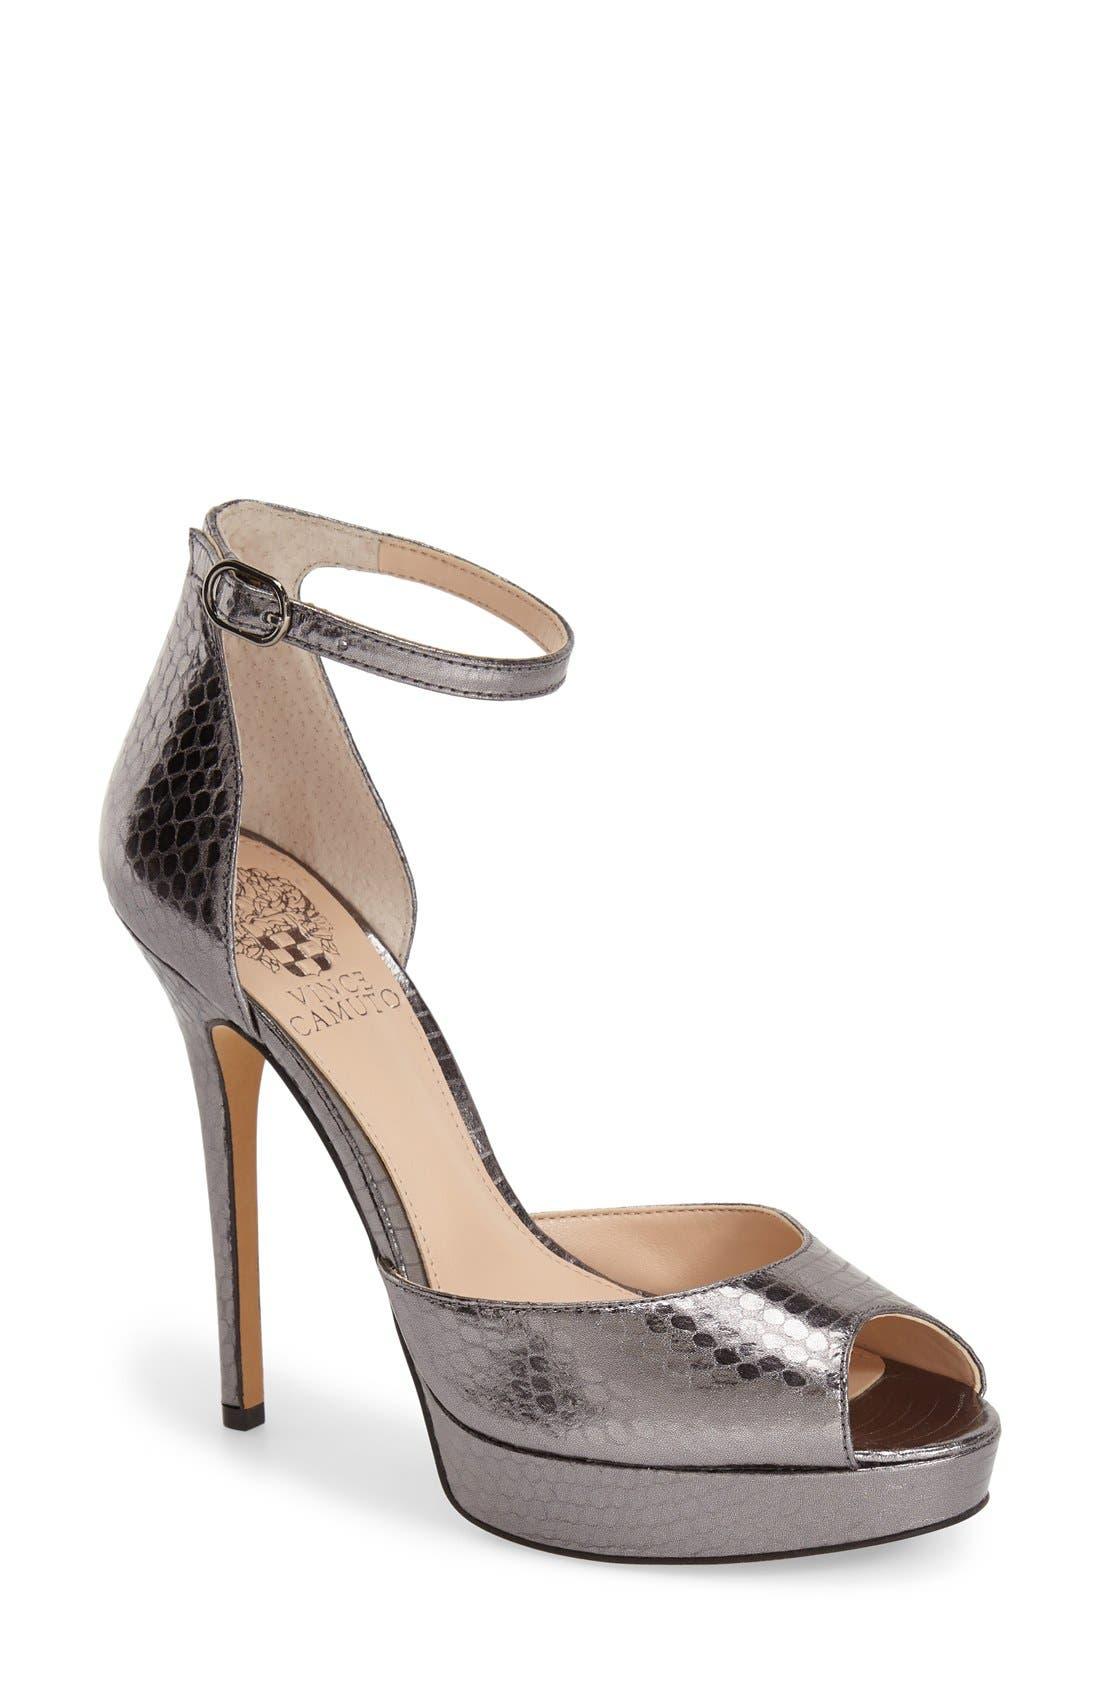 Alternate Image 1 Selected - Vince Camuto 'Lillith' Ankle Strap Platform Pump (Women)